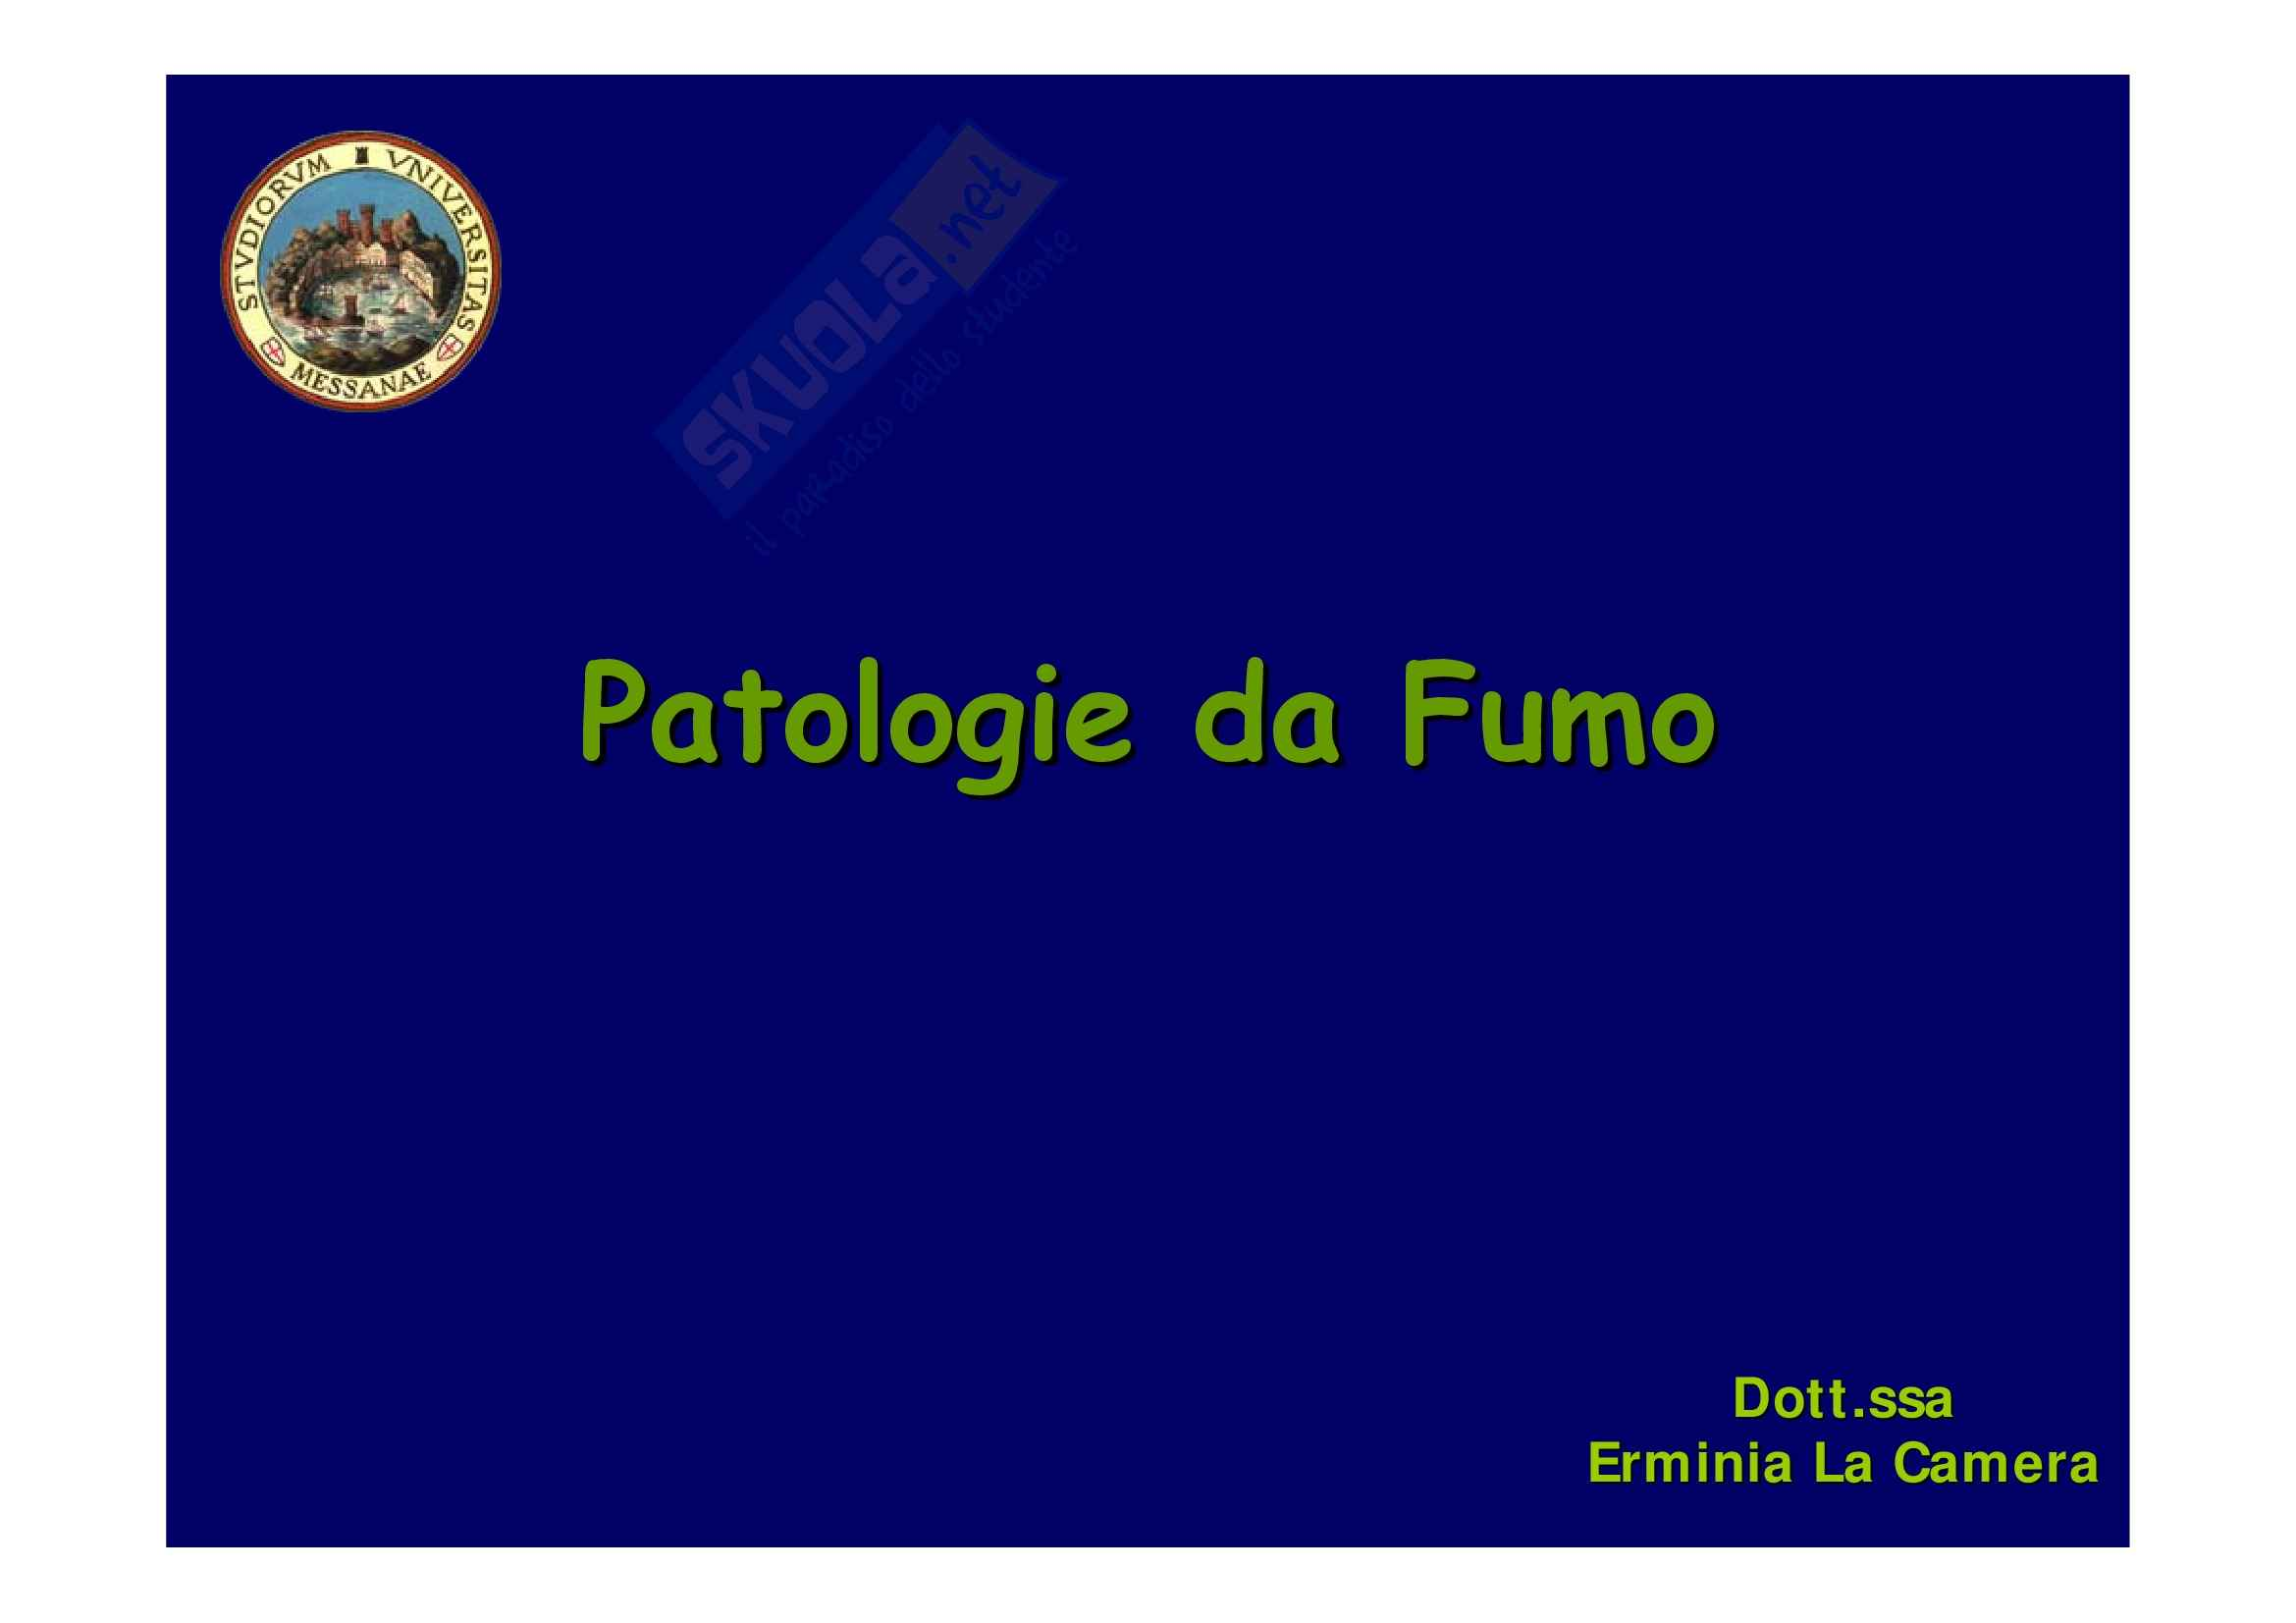 Patologia generale - patologie da agenti ambientali